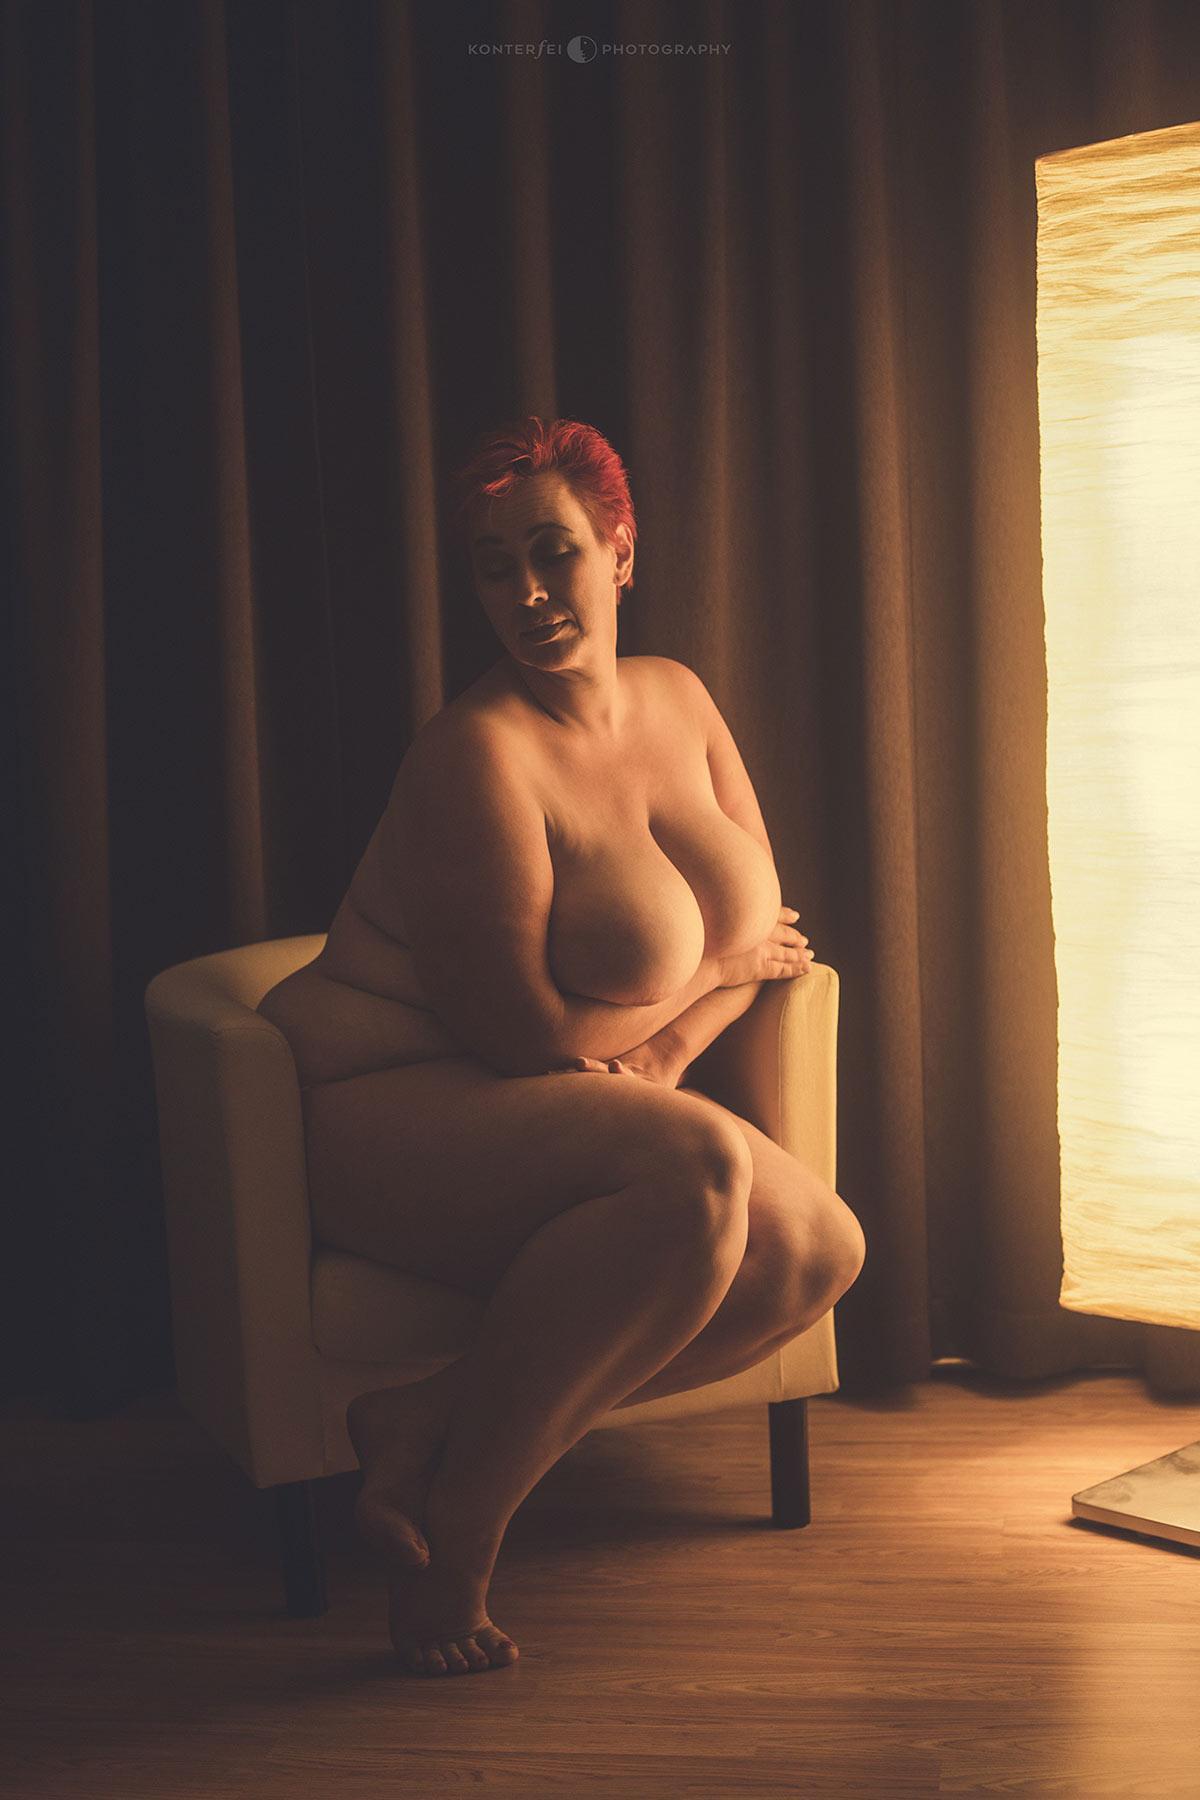 Curvylicious | Akt & Boudoir | Photography